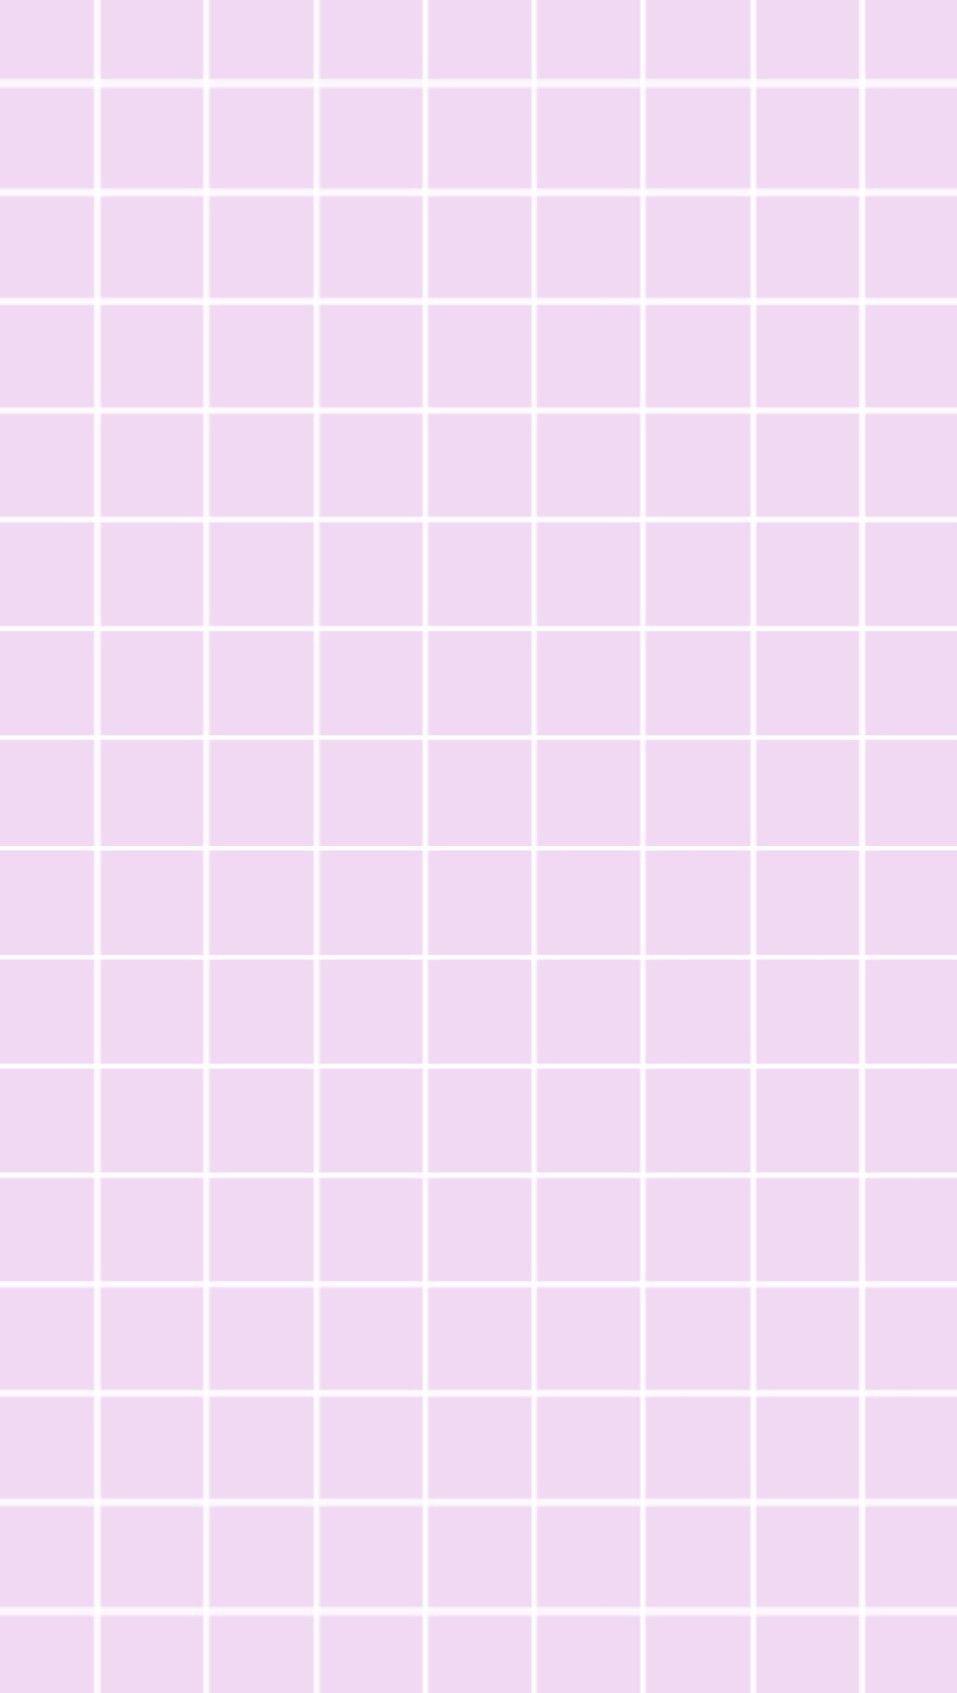 Wallpaper Background Aesthetic Locksreen Backgroundaesthetic Purple Grid Pastel Overlays Ungu Pastel Wallpaper Ponsel Kertas Dinding Aesthetic light pink grid wallpaper